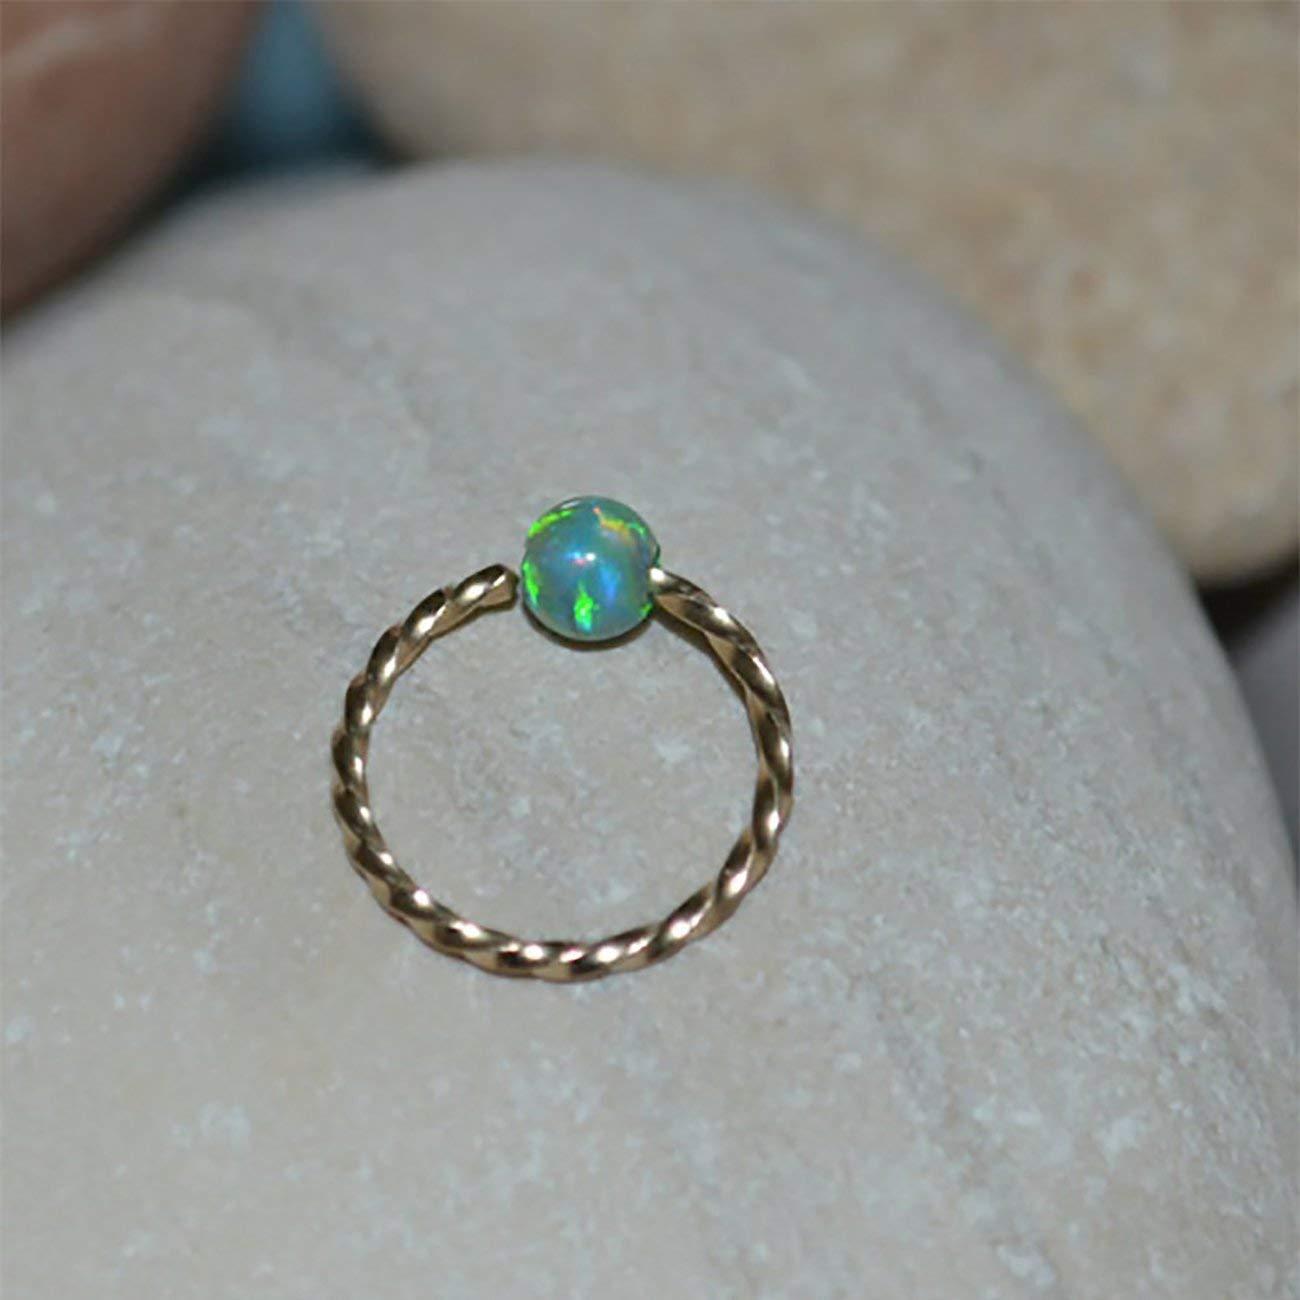 9d9eda5ee Get Quotations · 3mm Opal NOSE RING // Gold Nose Ring Stud - 20 gauge  Cartilage Earring -